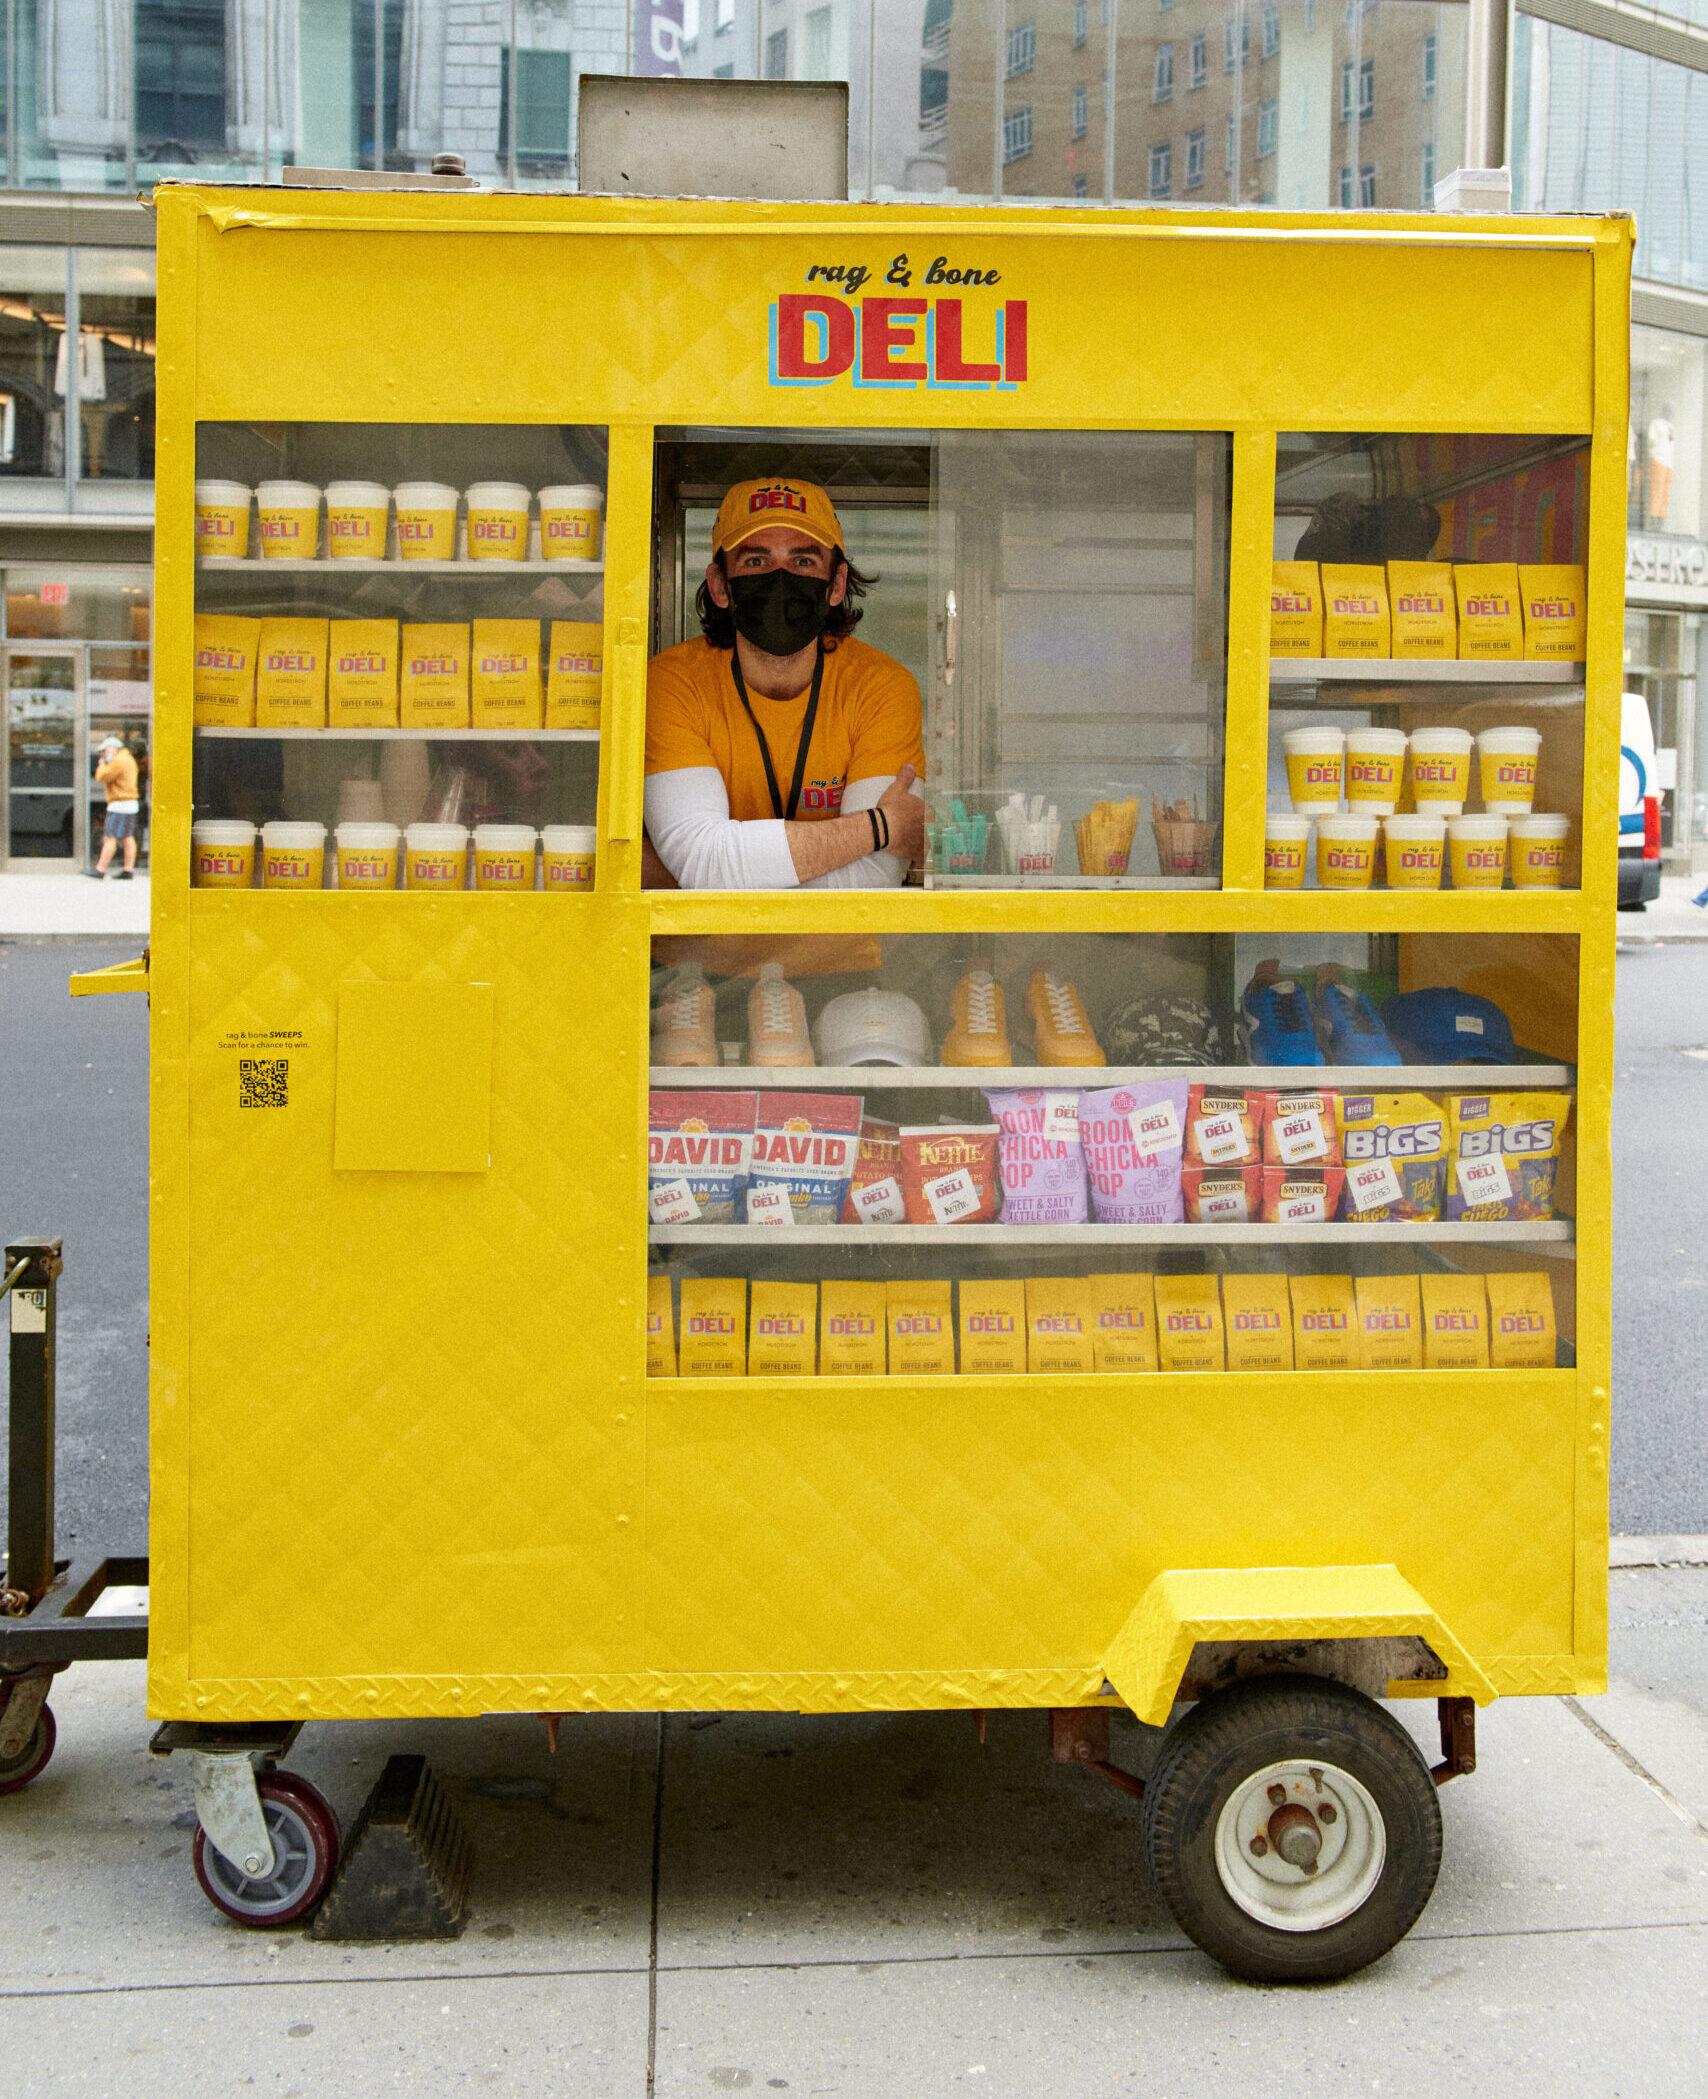 NYC Experiential Marketing Rag & Bone Deli